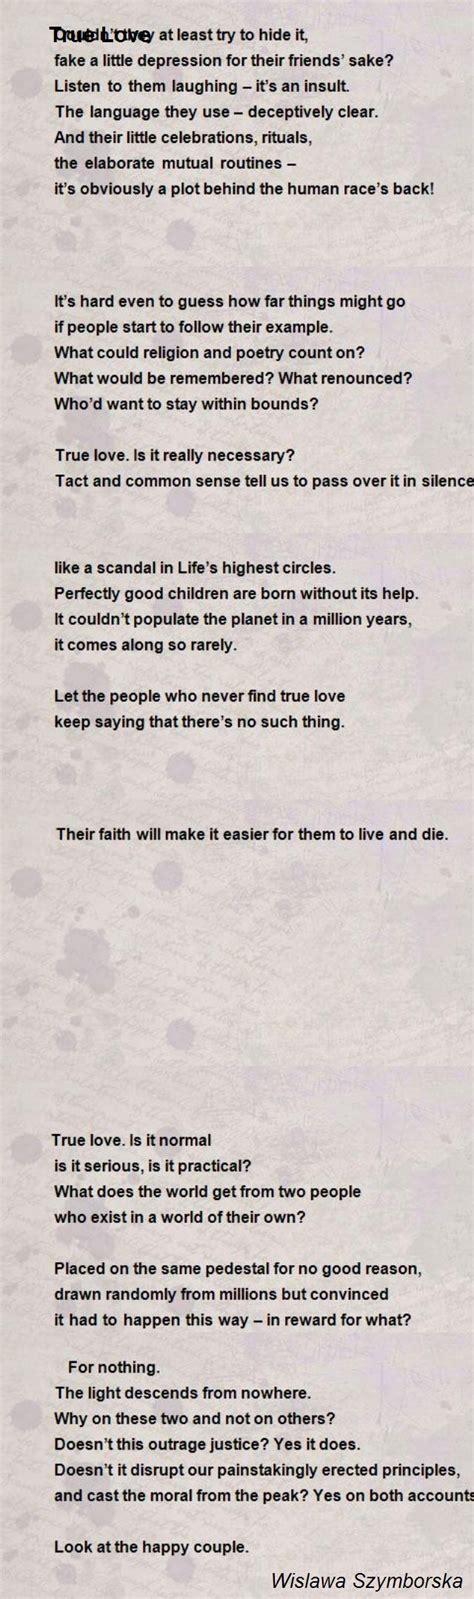 true poem by wislawa szymborska poem comments